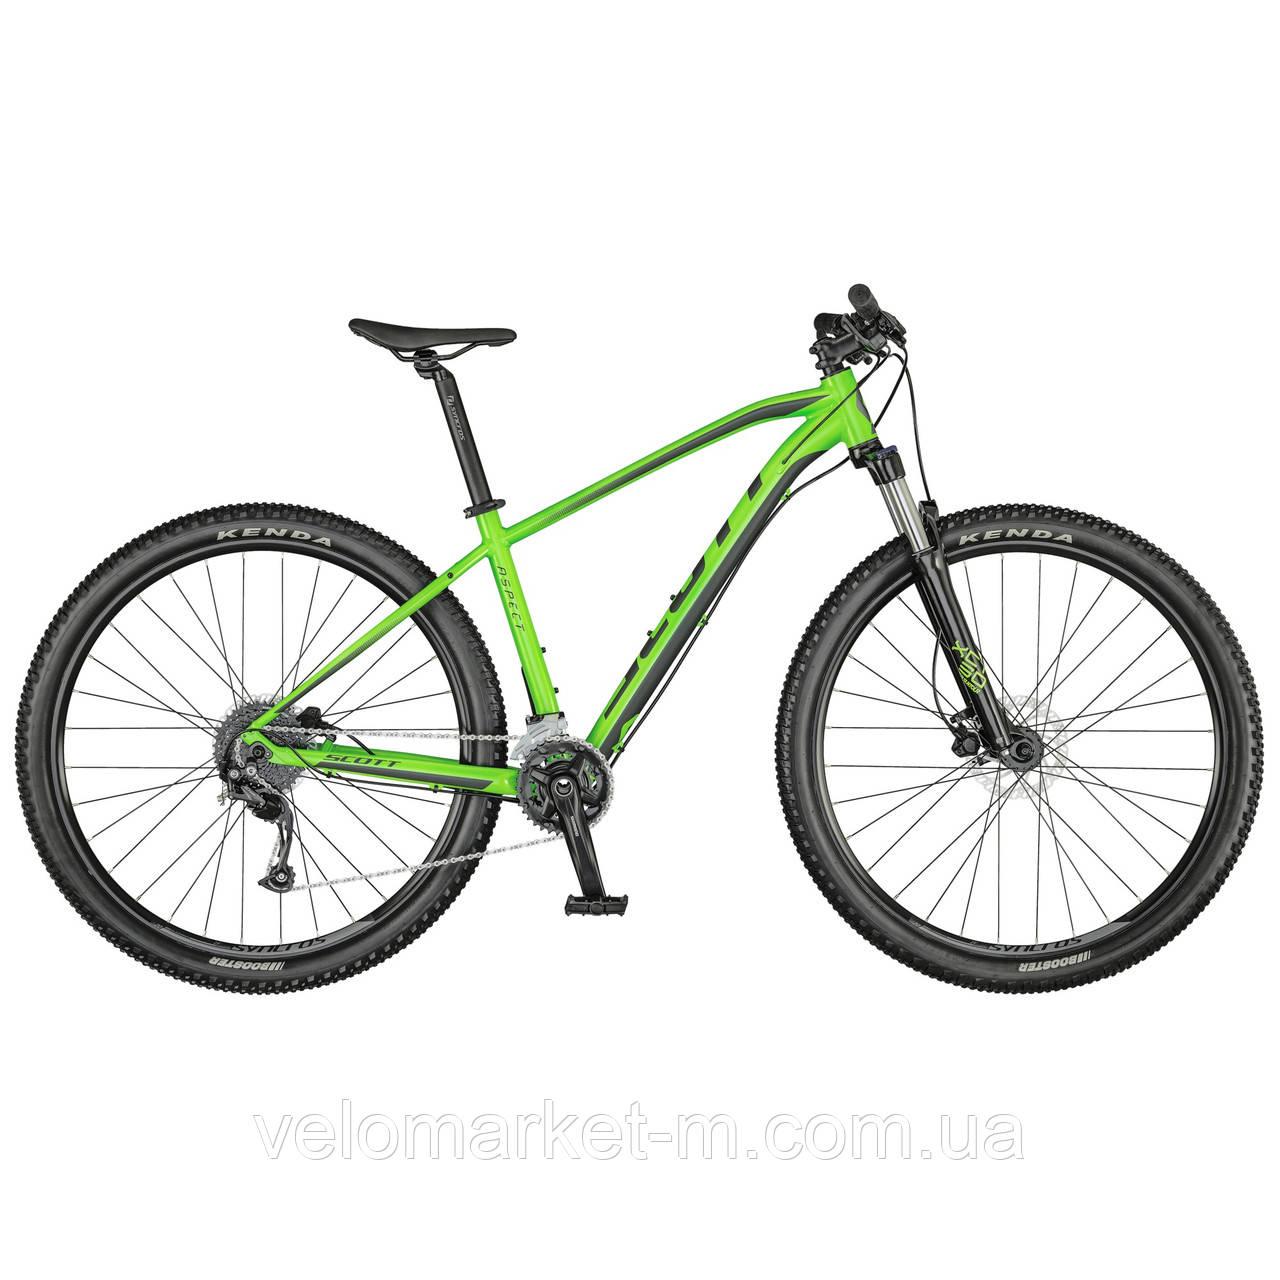 Велосипед Scott ASPECT 950 XL Smith green 2021